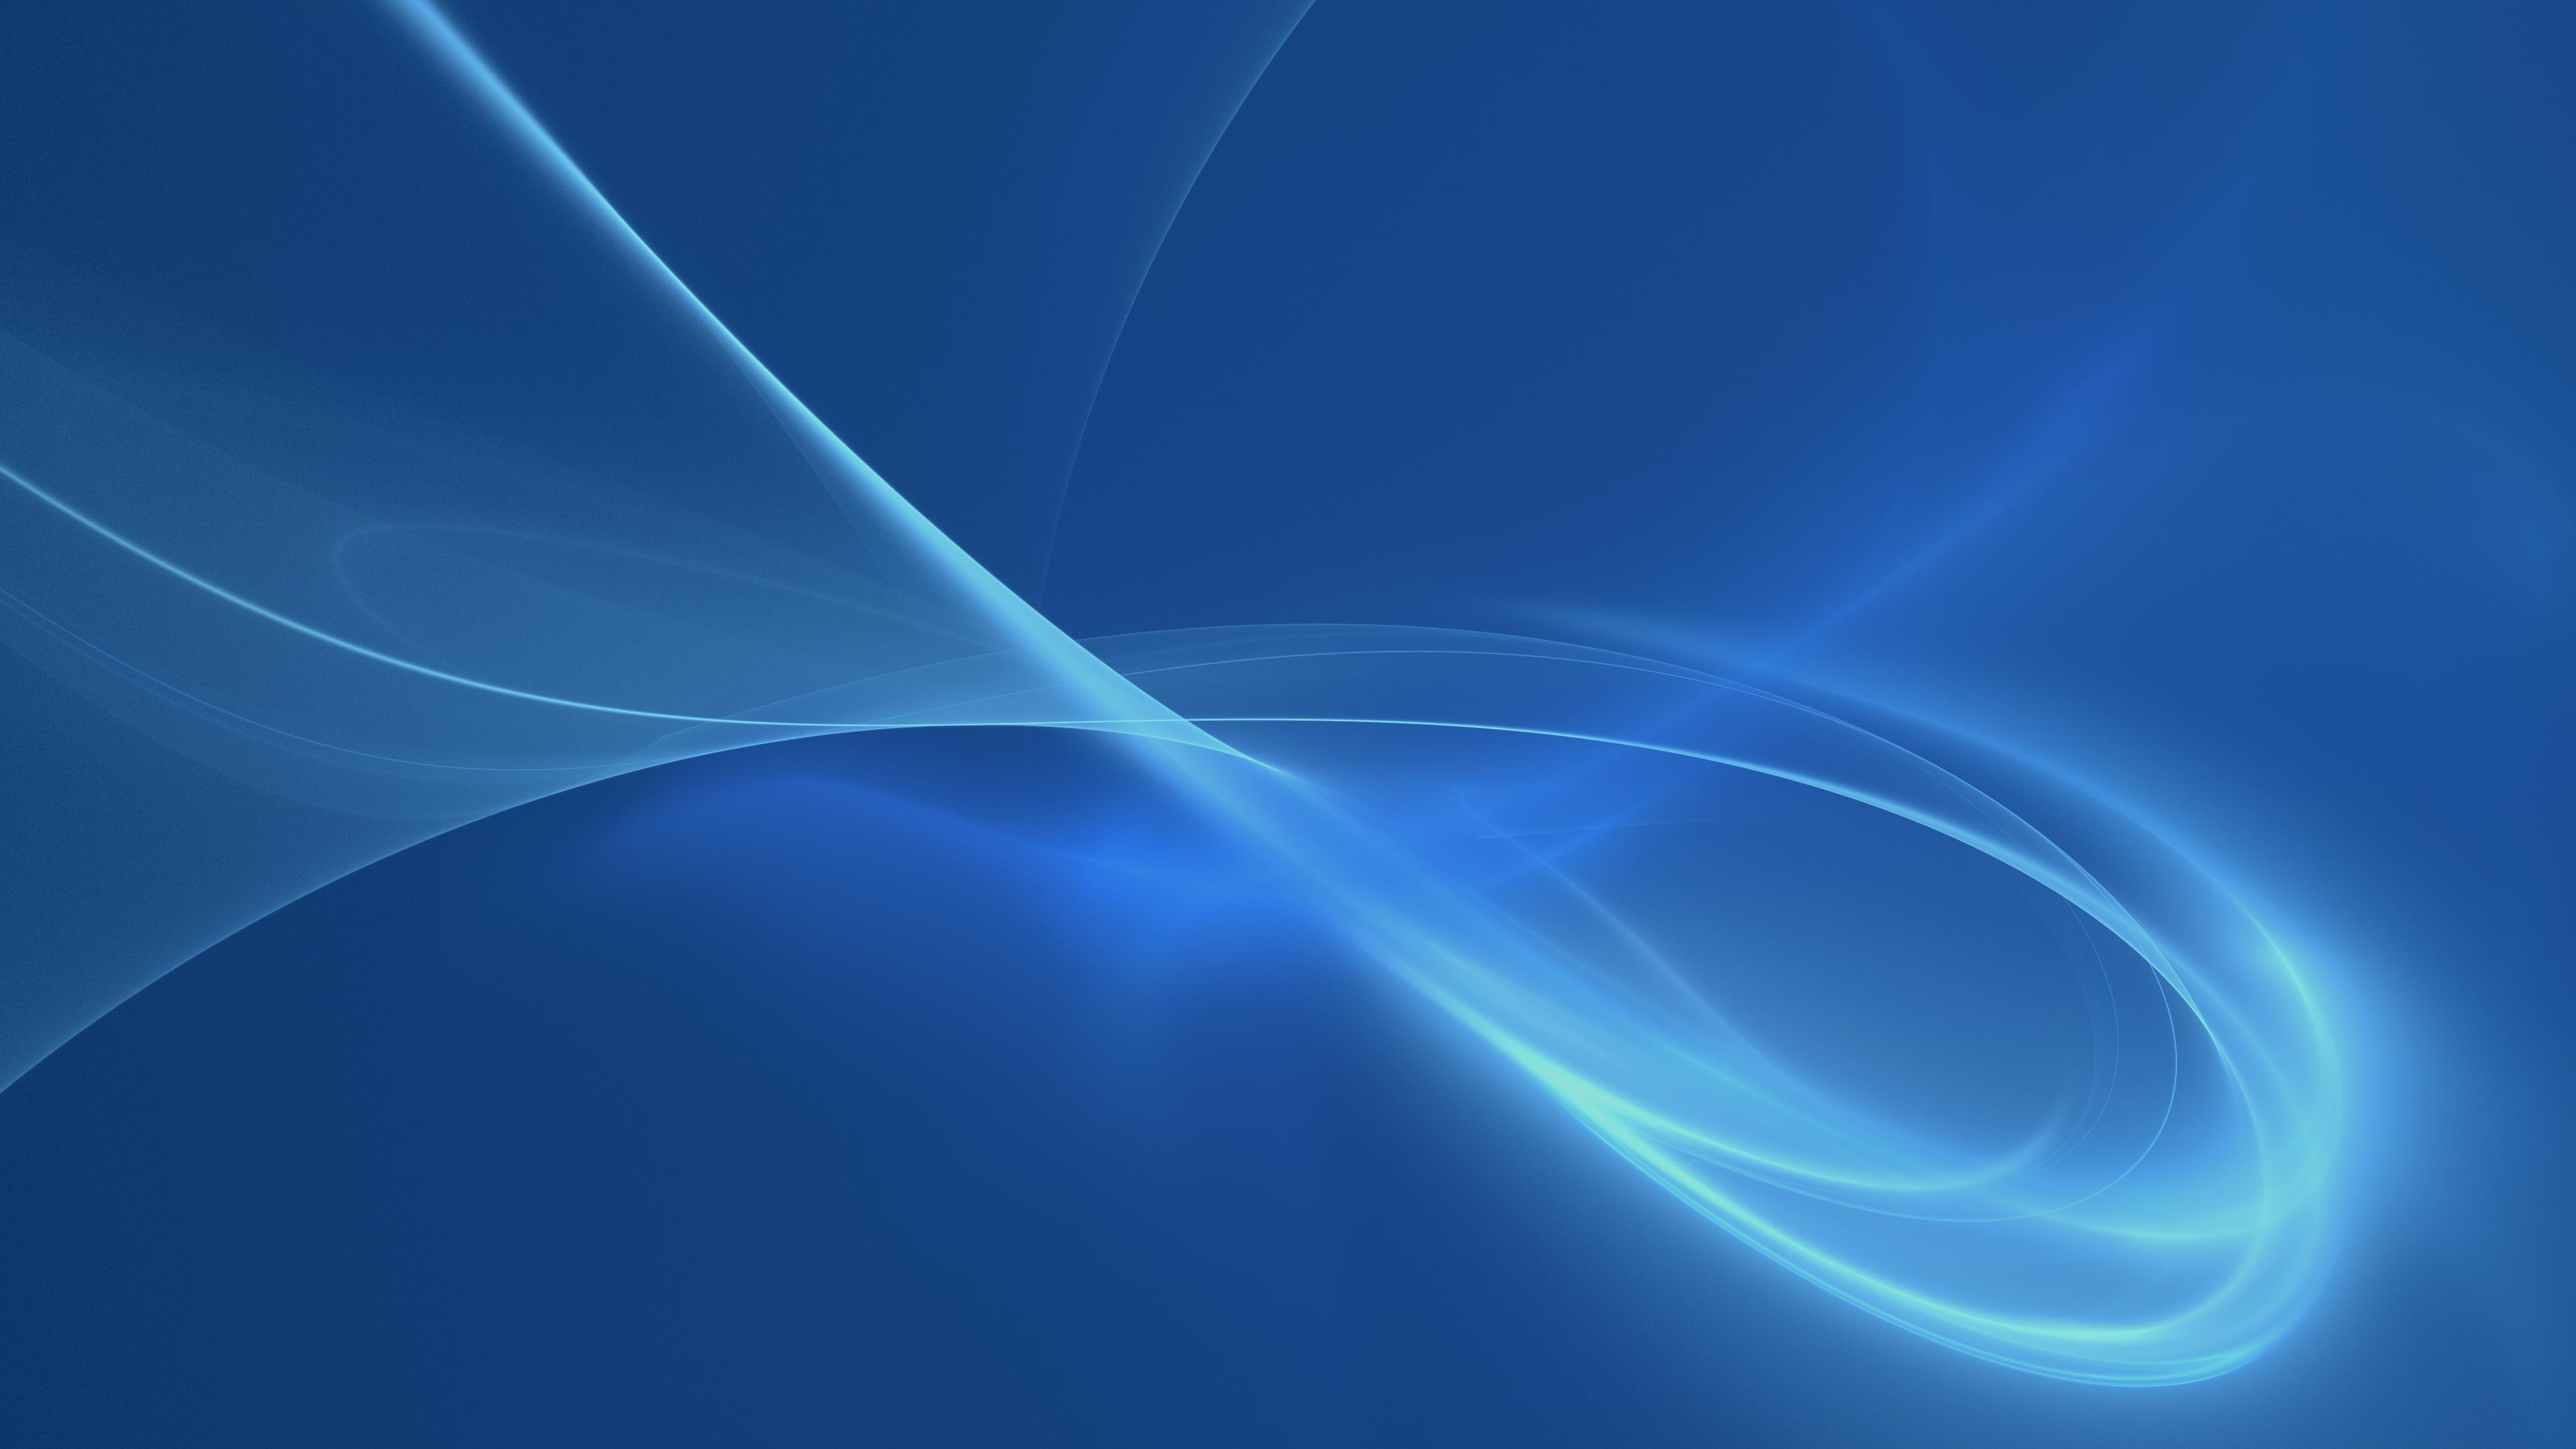 General 3840x2160 3D Abstract fractal Apophysis